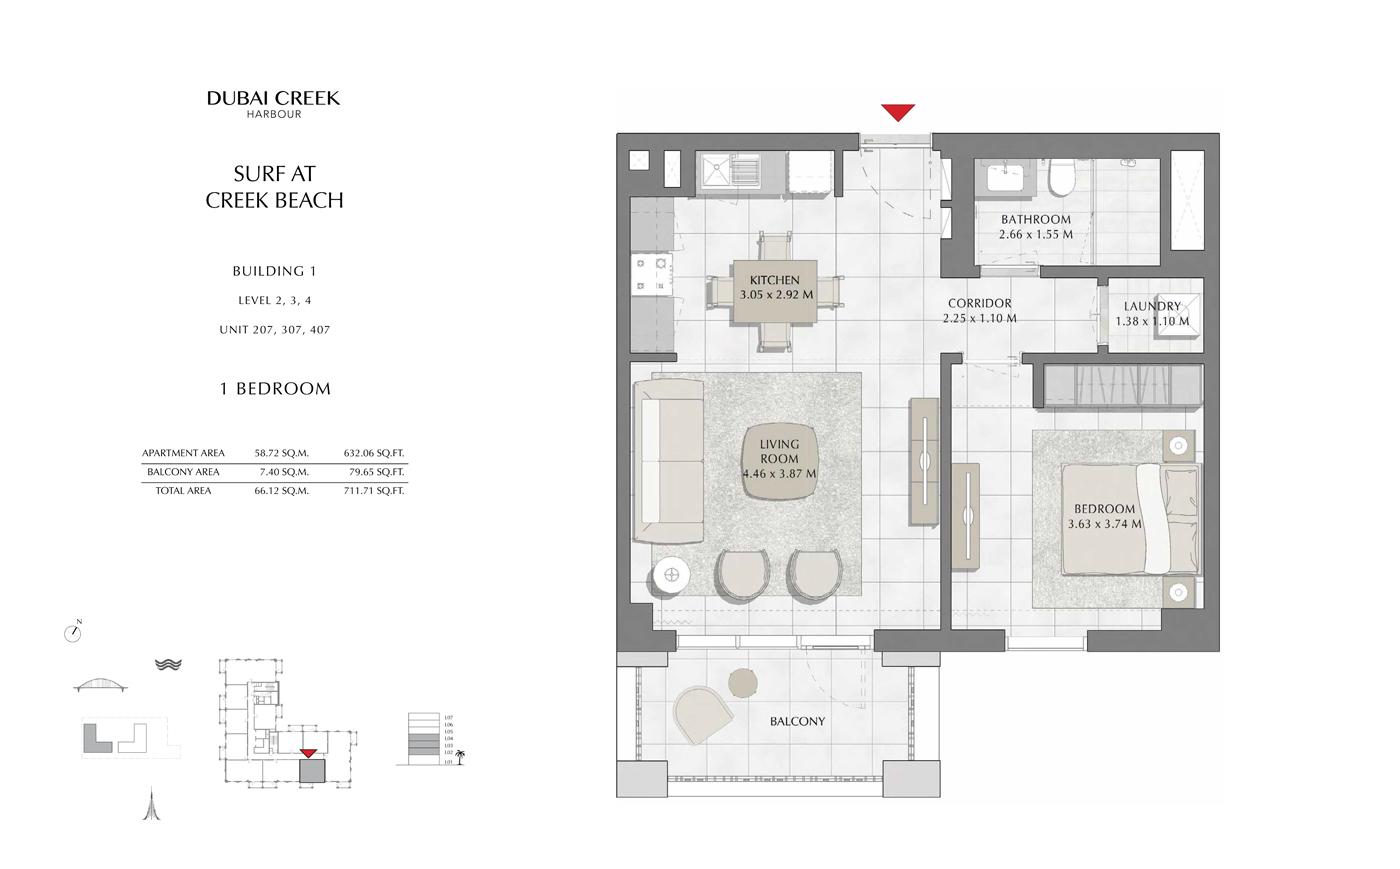 Building 1, 1 Bedroom, Level 2, 3, 4, Size 711 Sq Ft